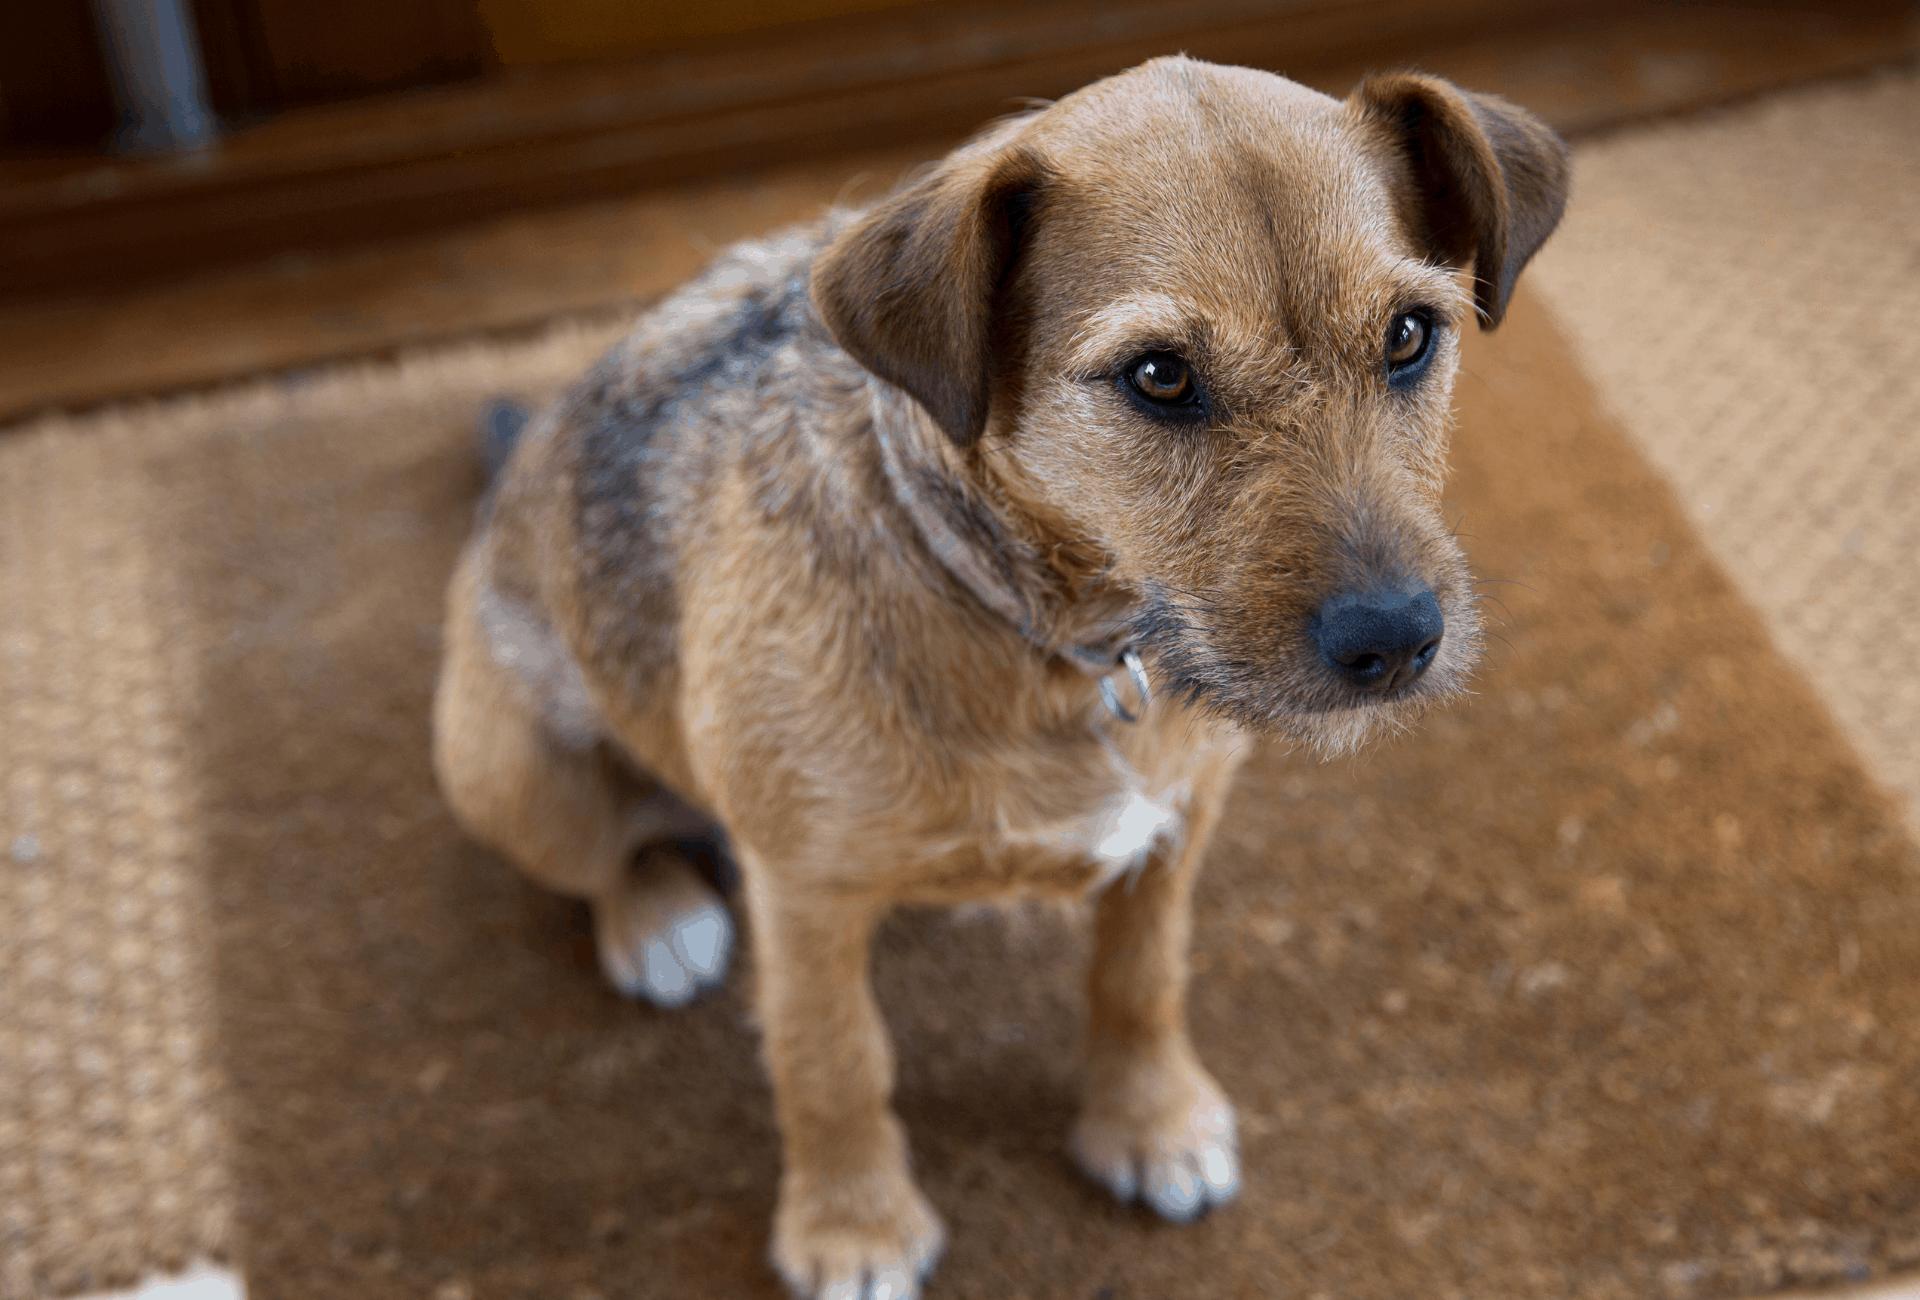 Dog sitting on doormat